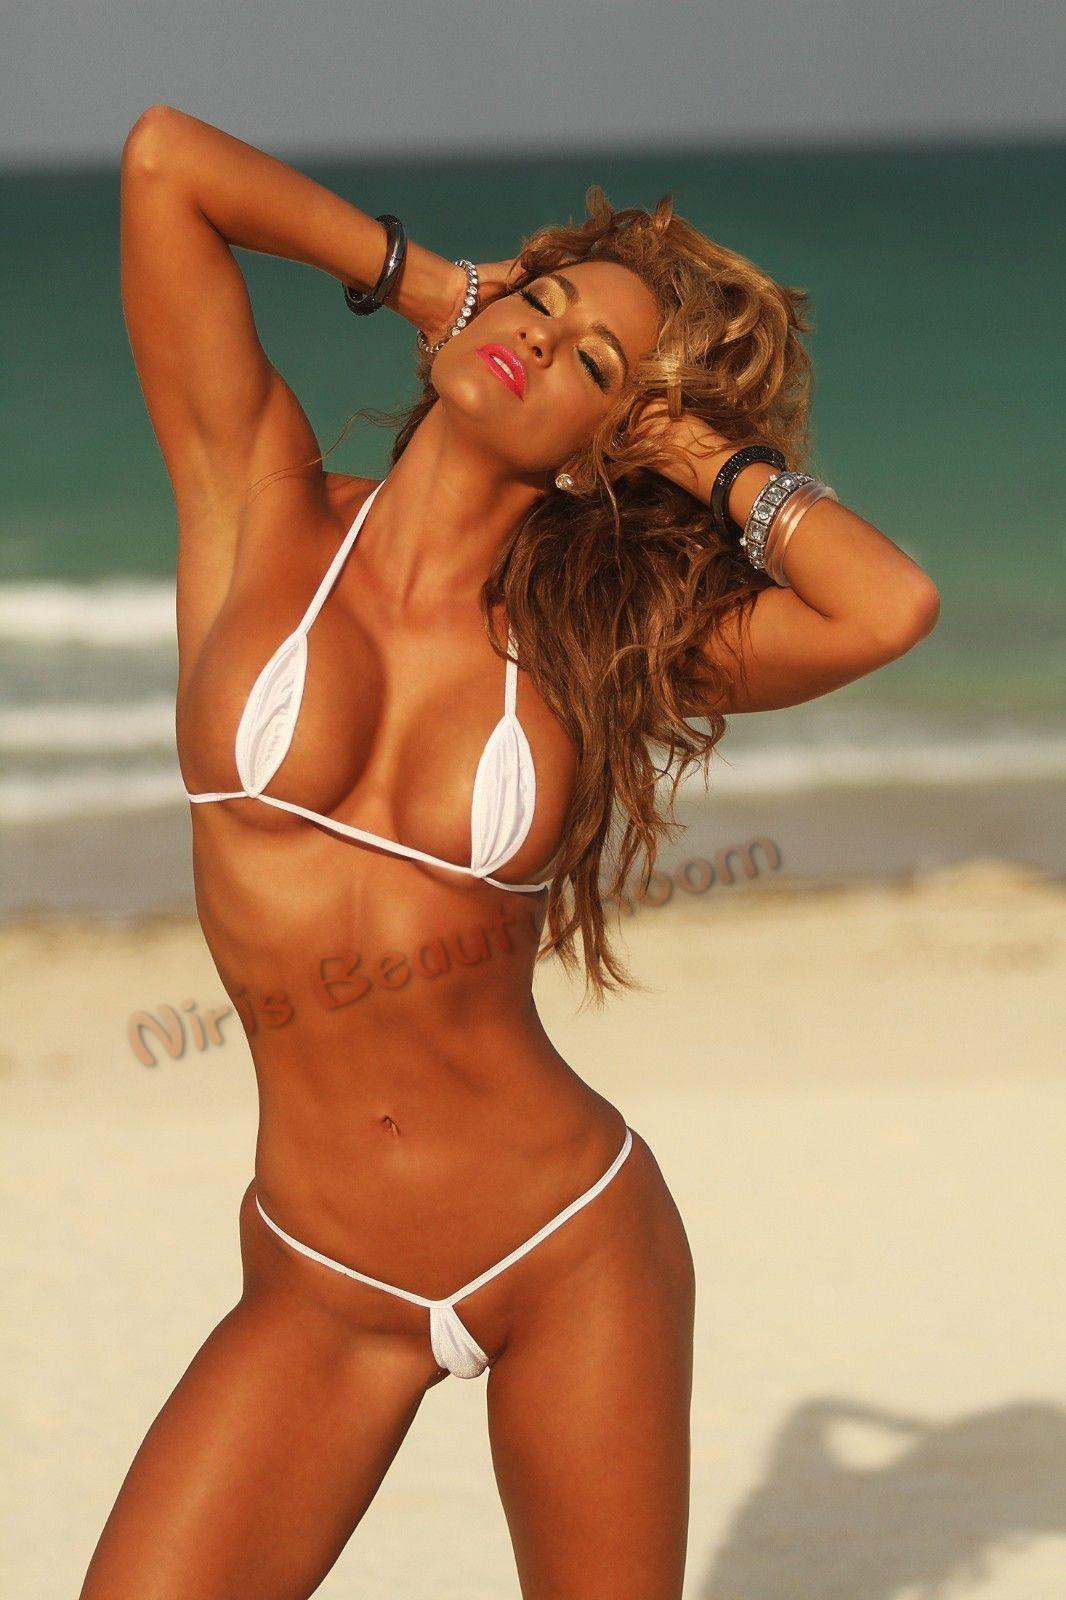 Фото пляж микро бикини 24 фотография